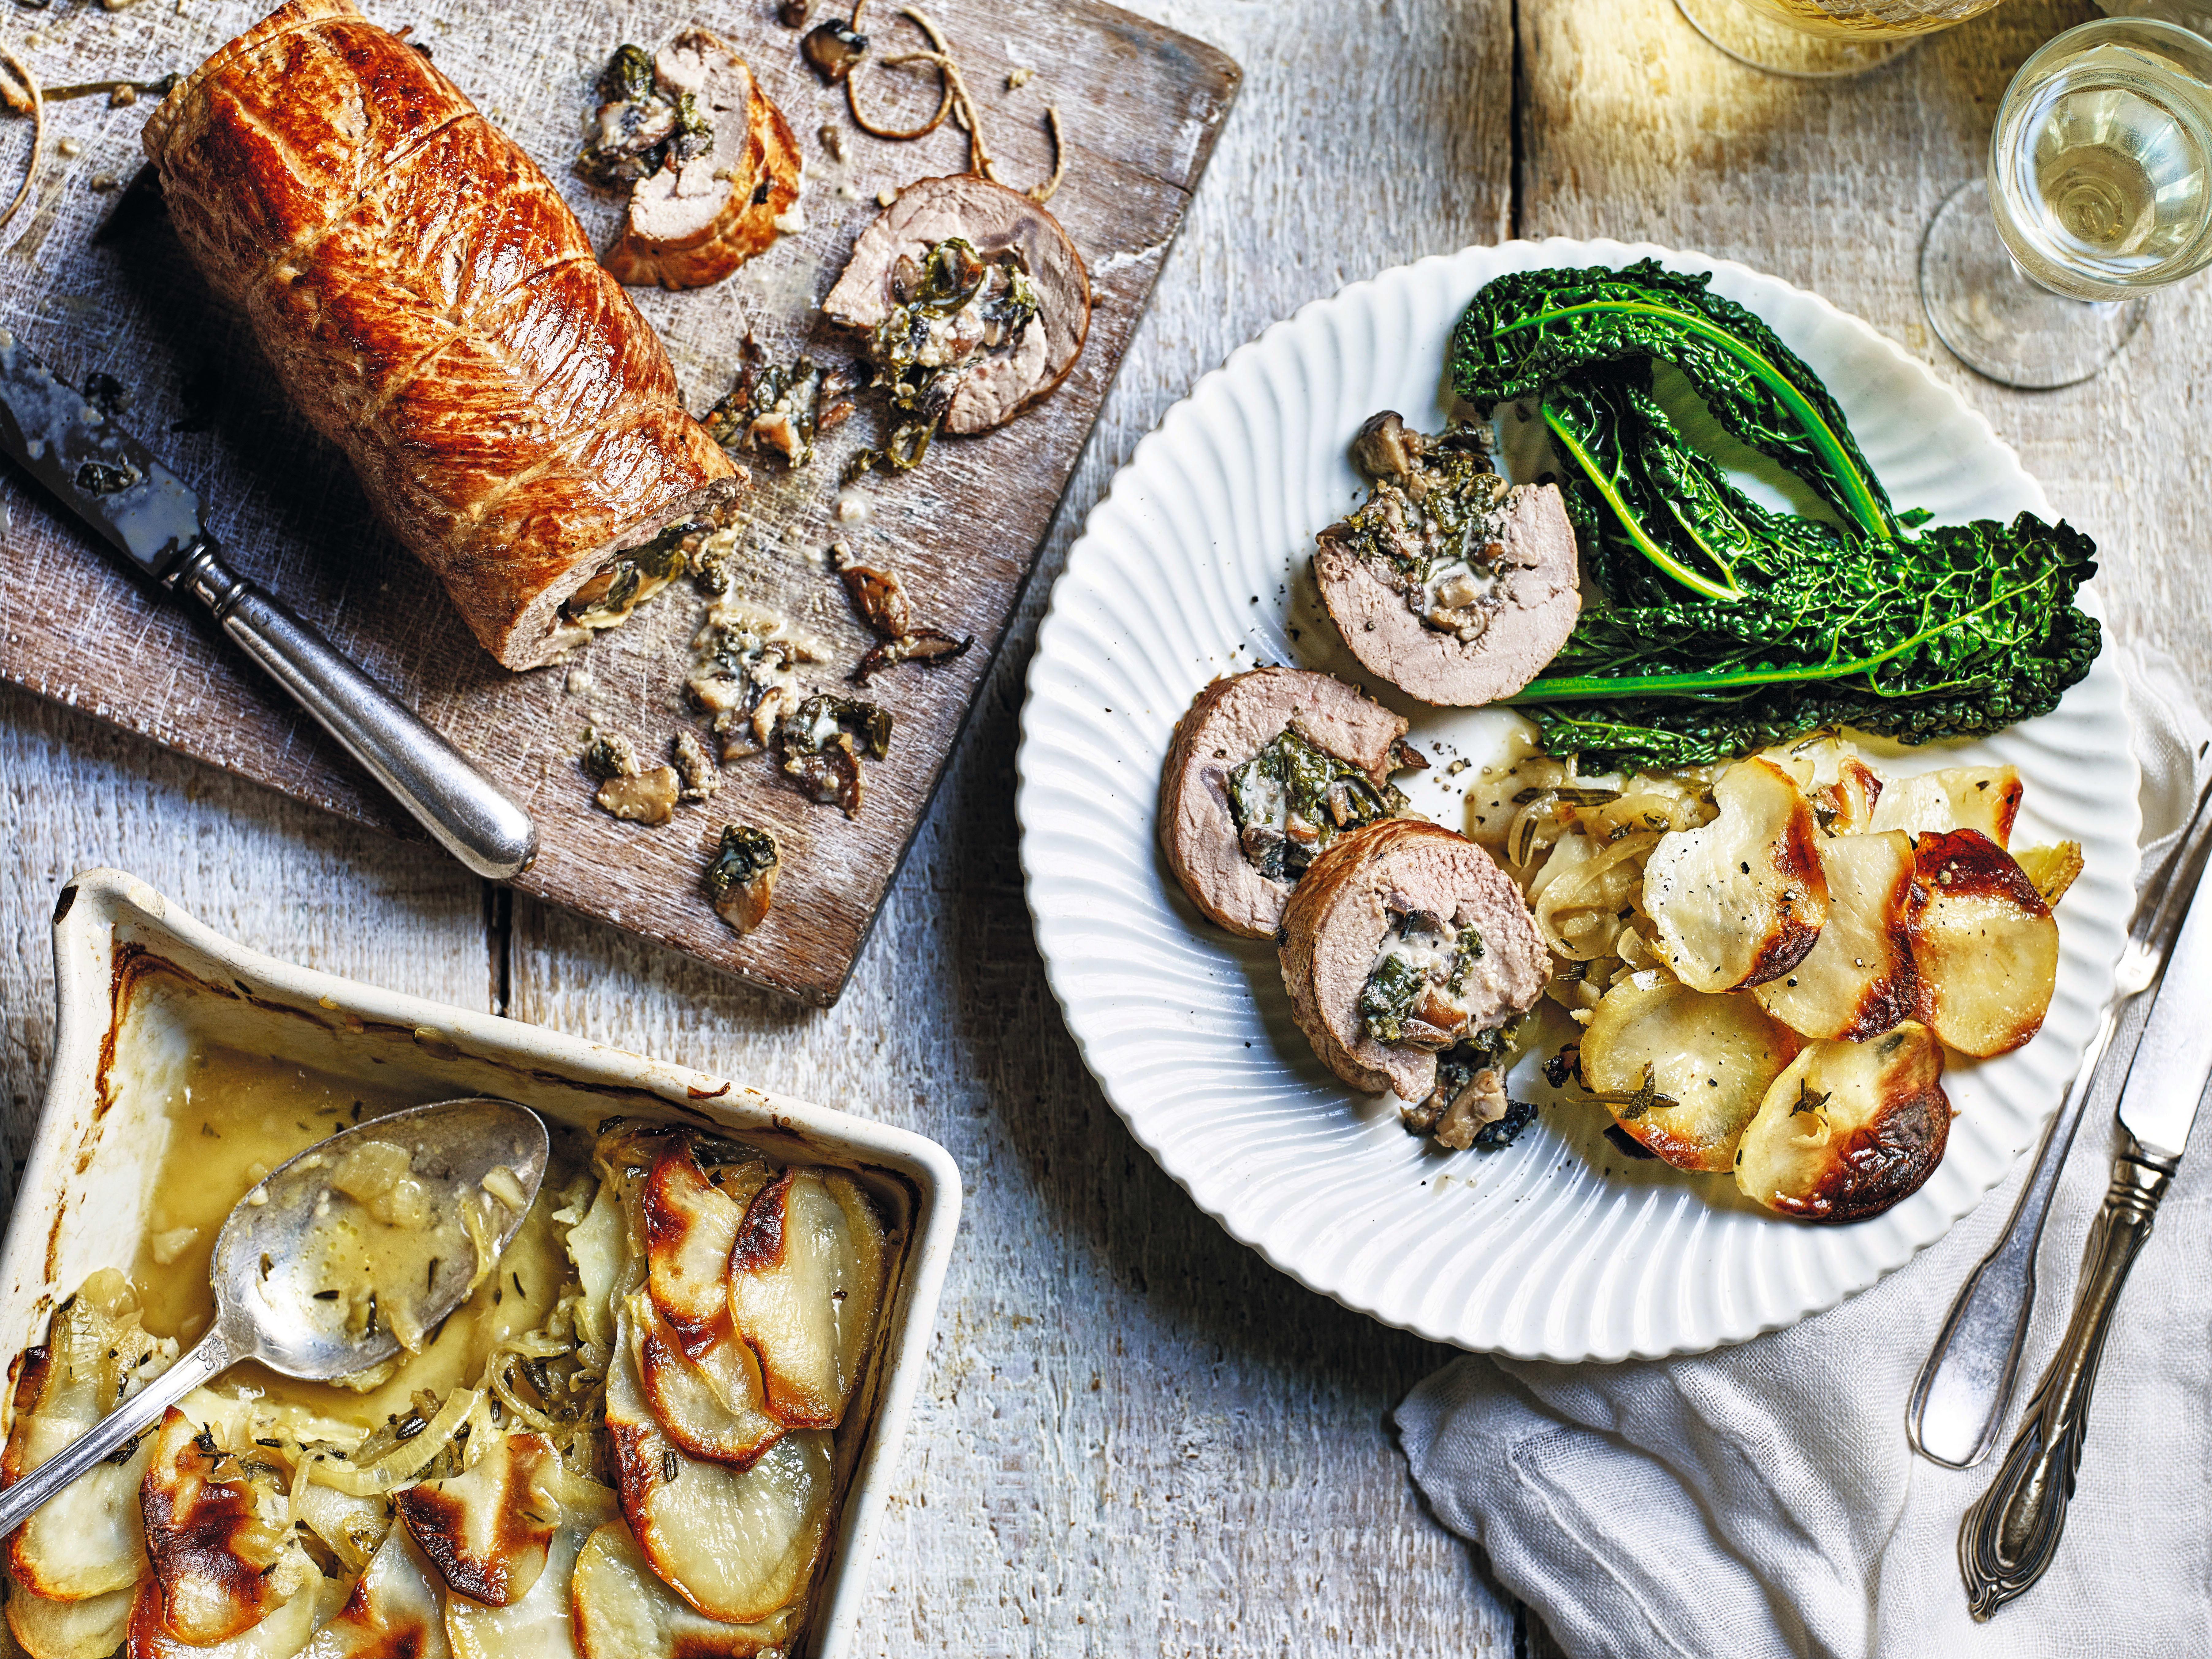 Photo of Wild mushroom & spinach stuffed pork loin by WW